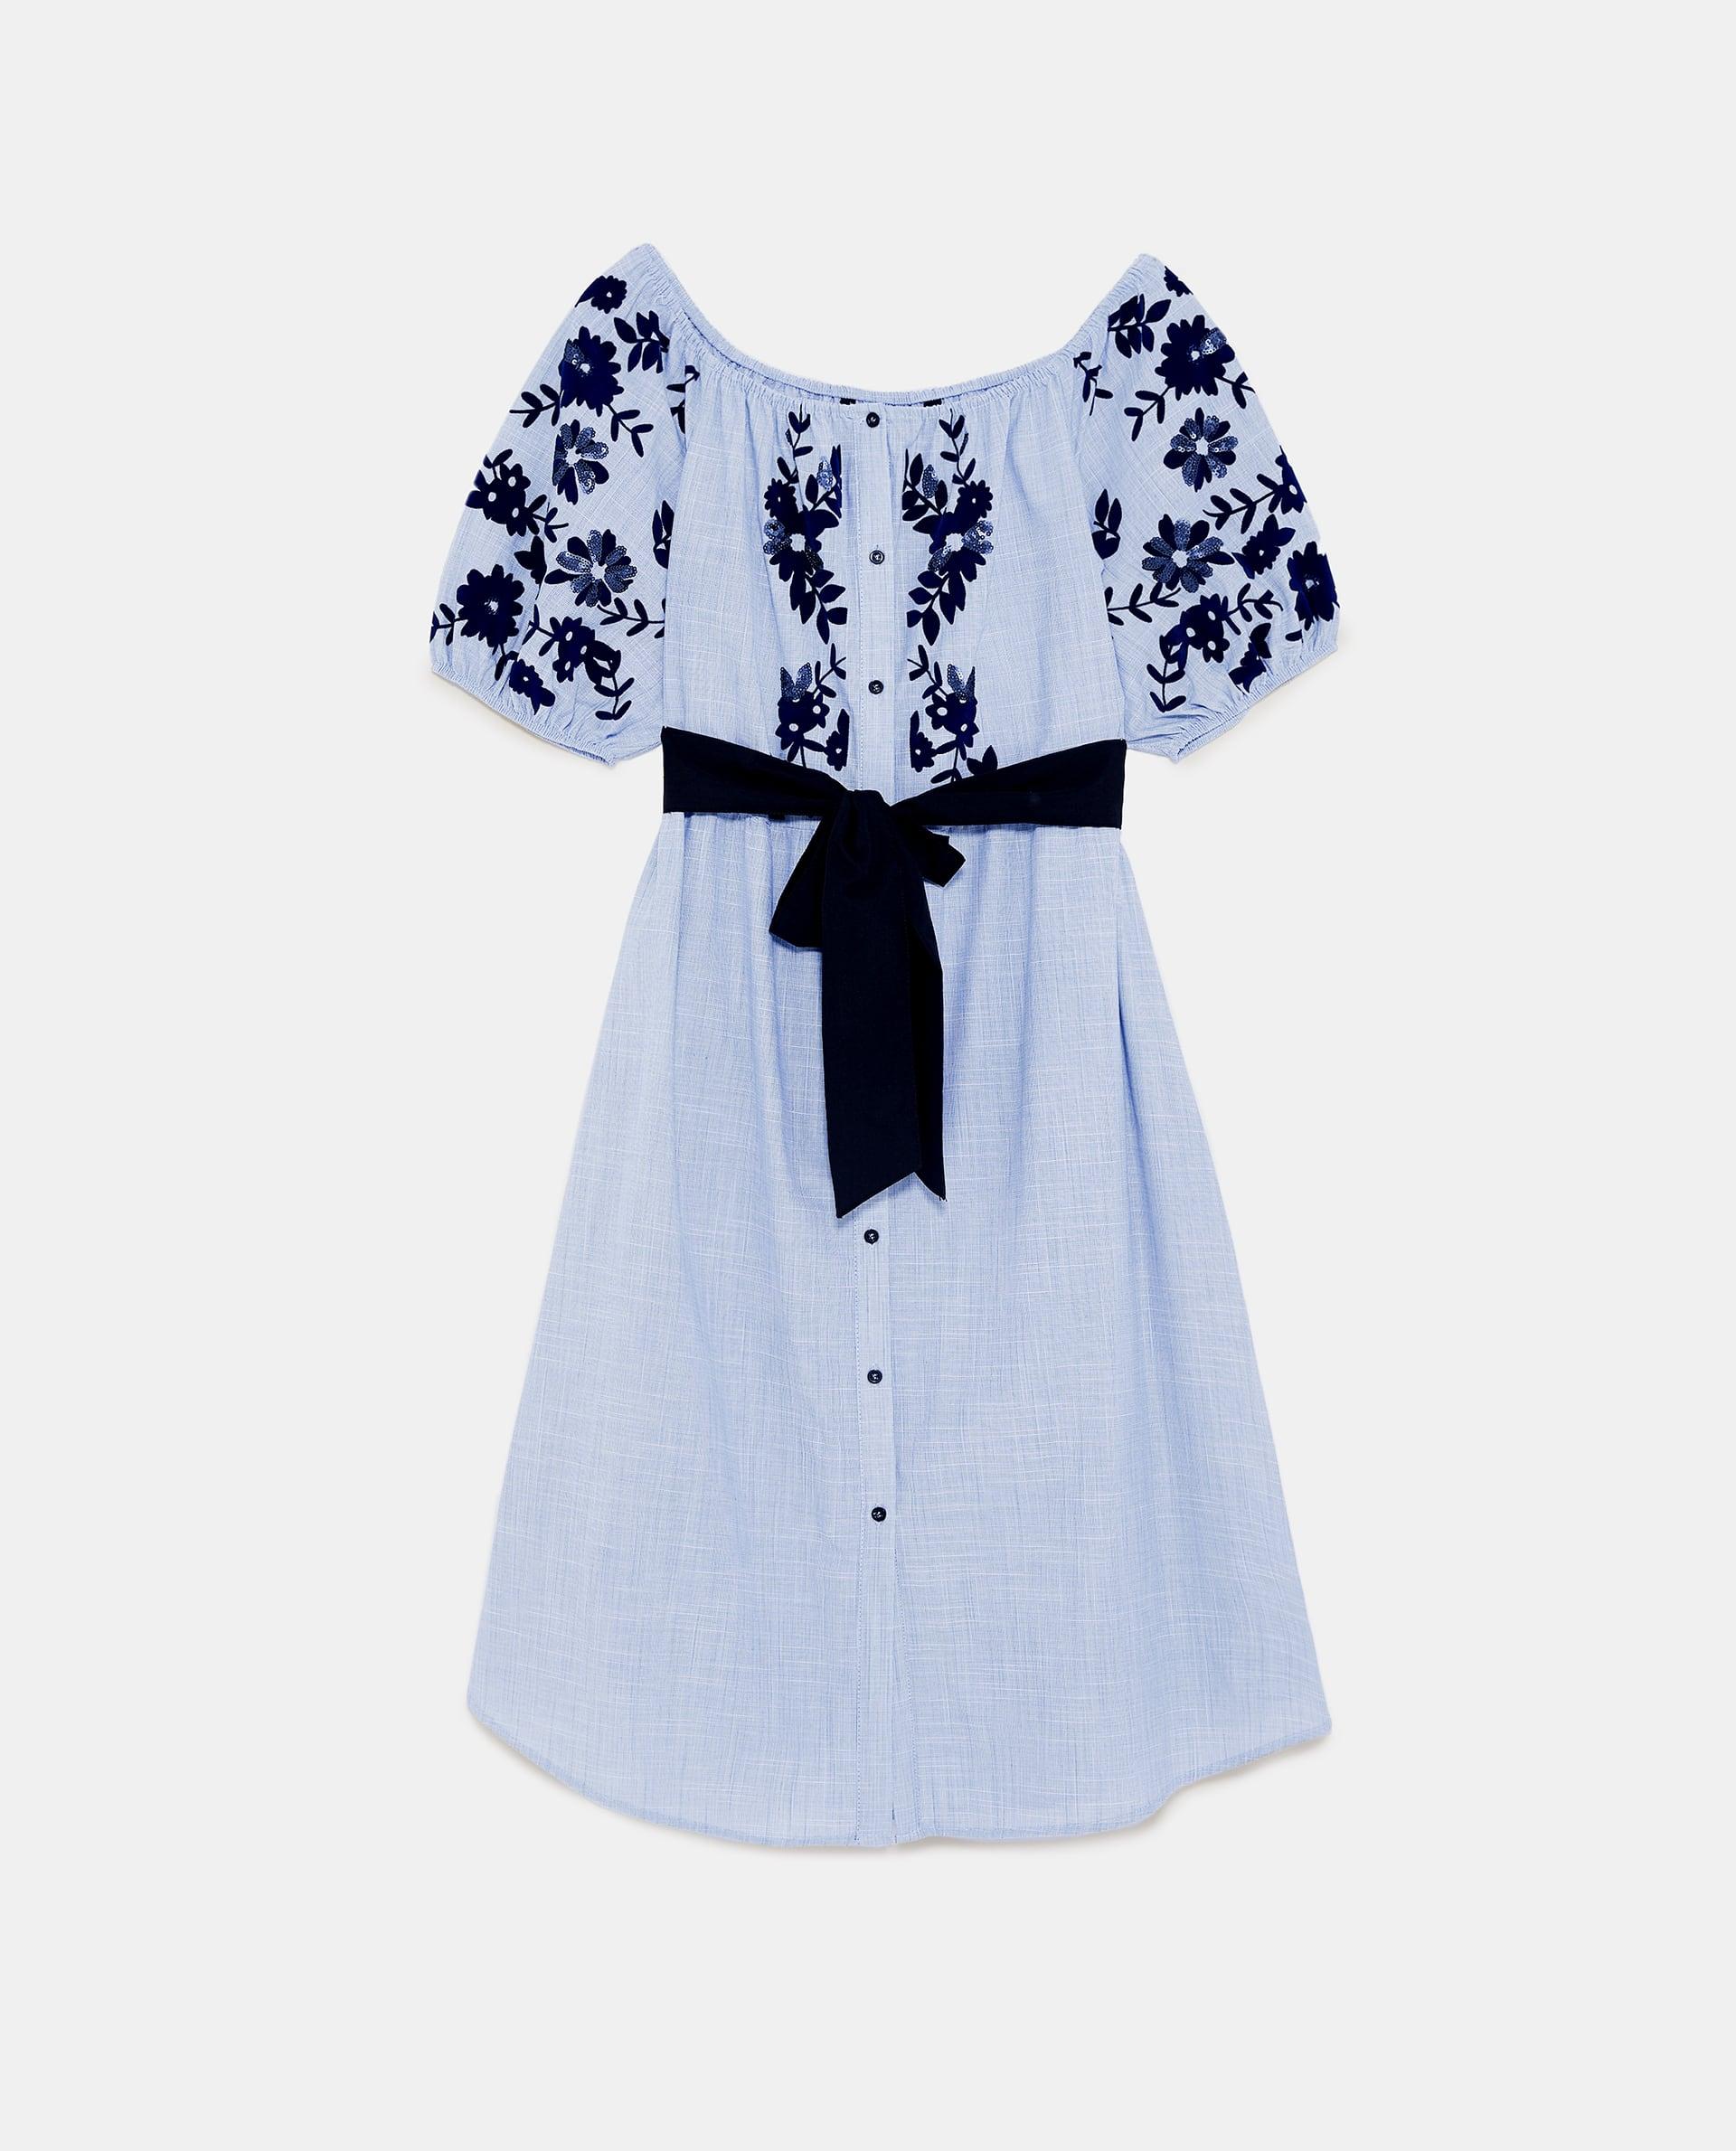 5afe13a8 Kate Middleton spotted in floral dress from Zara worth AU $70 | Nova 969